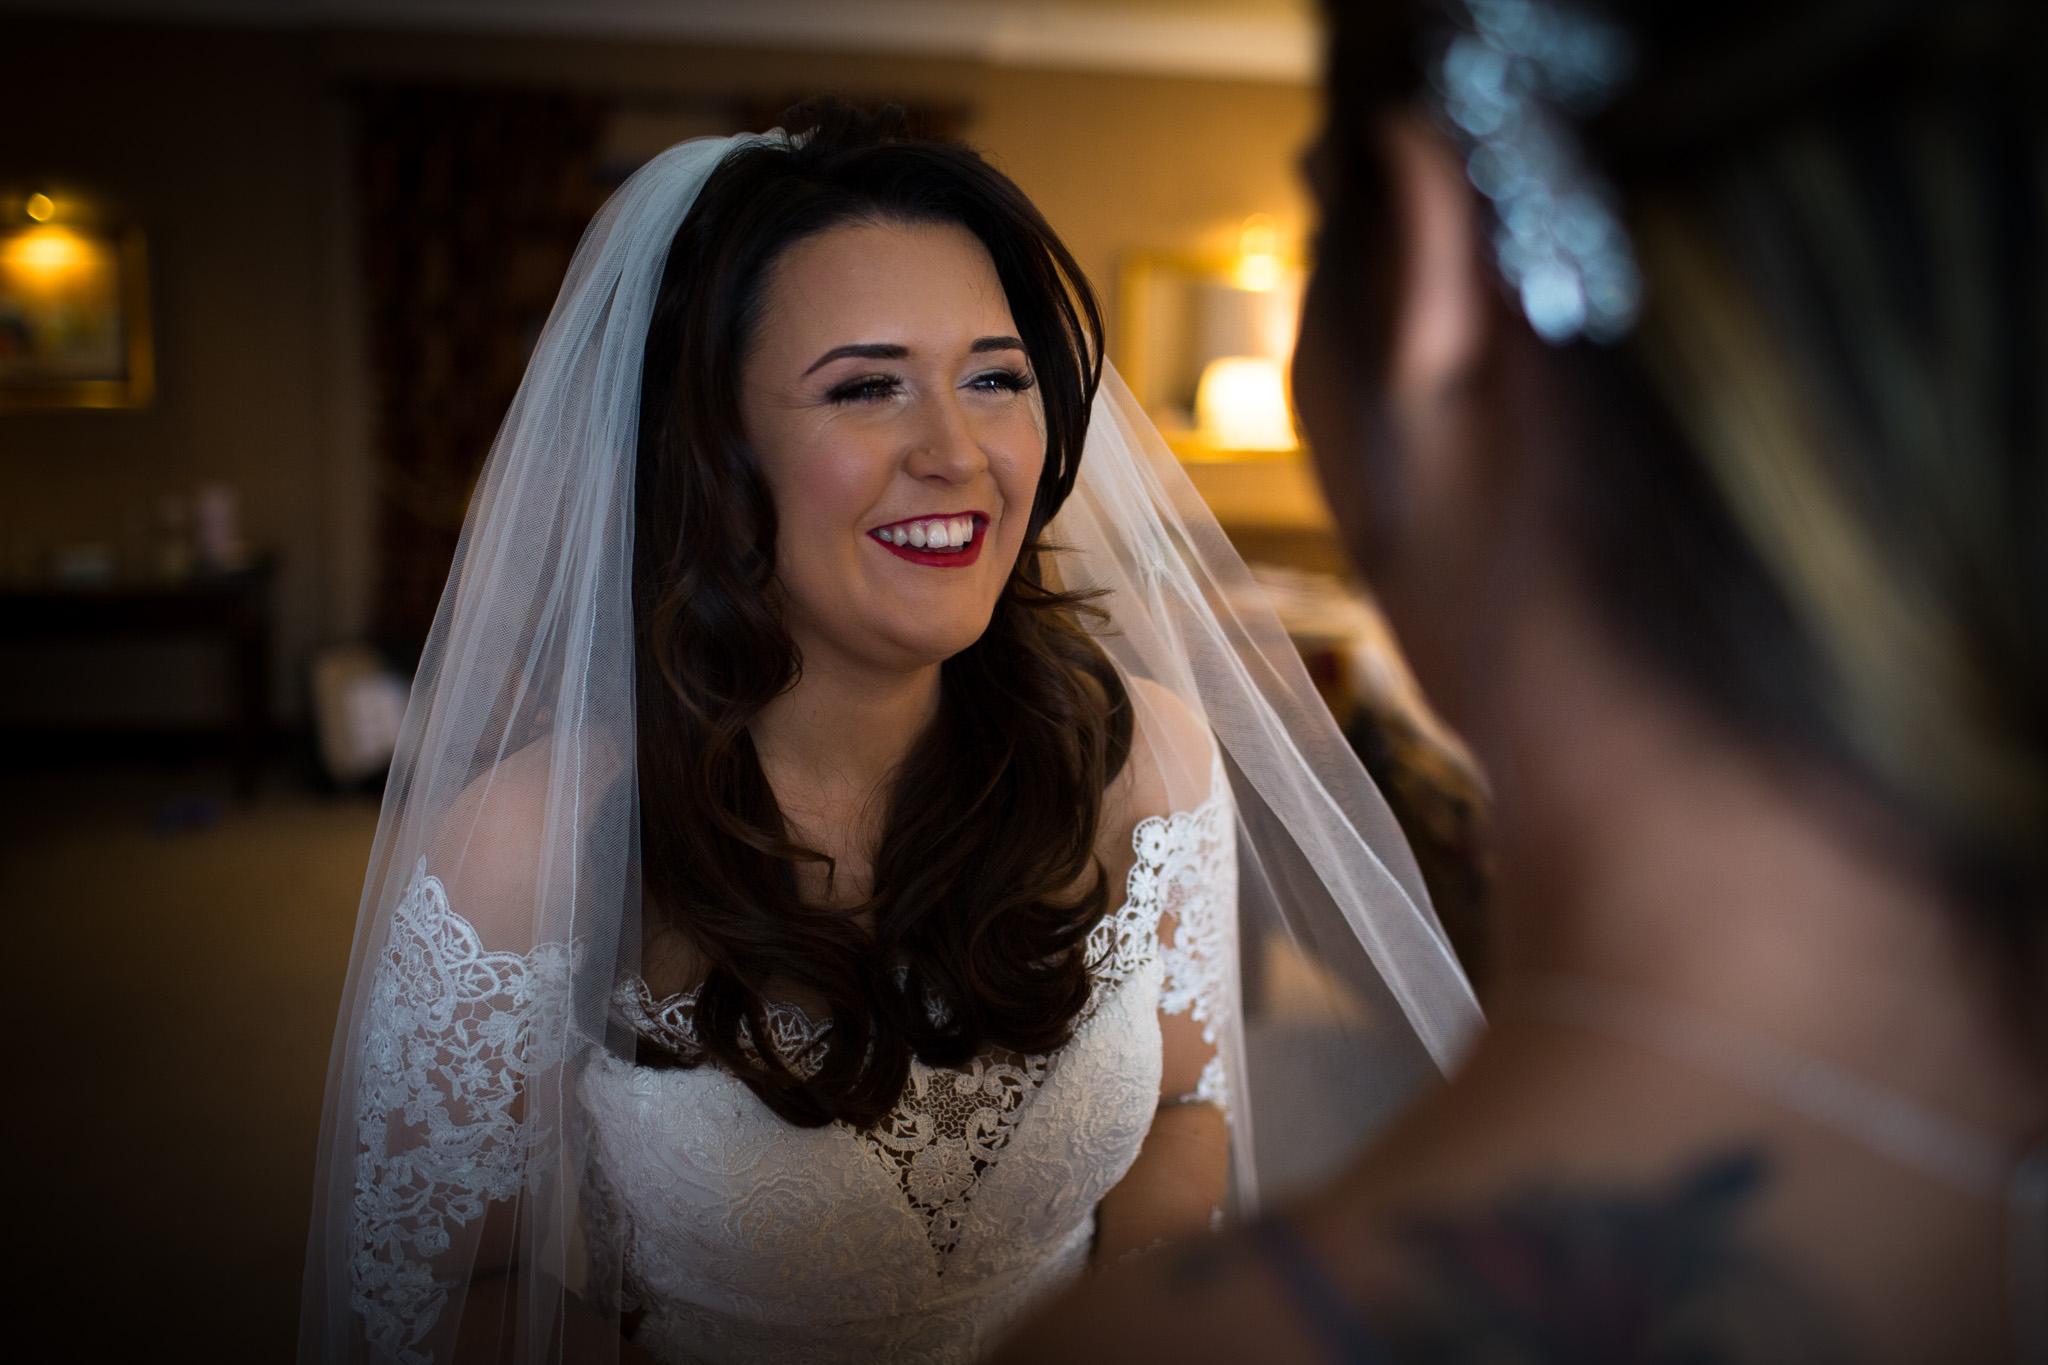 Mark_Barnes_Northern_Ireland_wedding_photographer_Harveys_Point_Donegall_Wedding_photography-Adam&Gemma-11.jpg